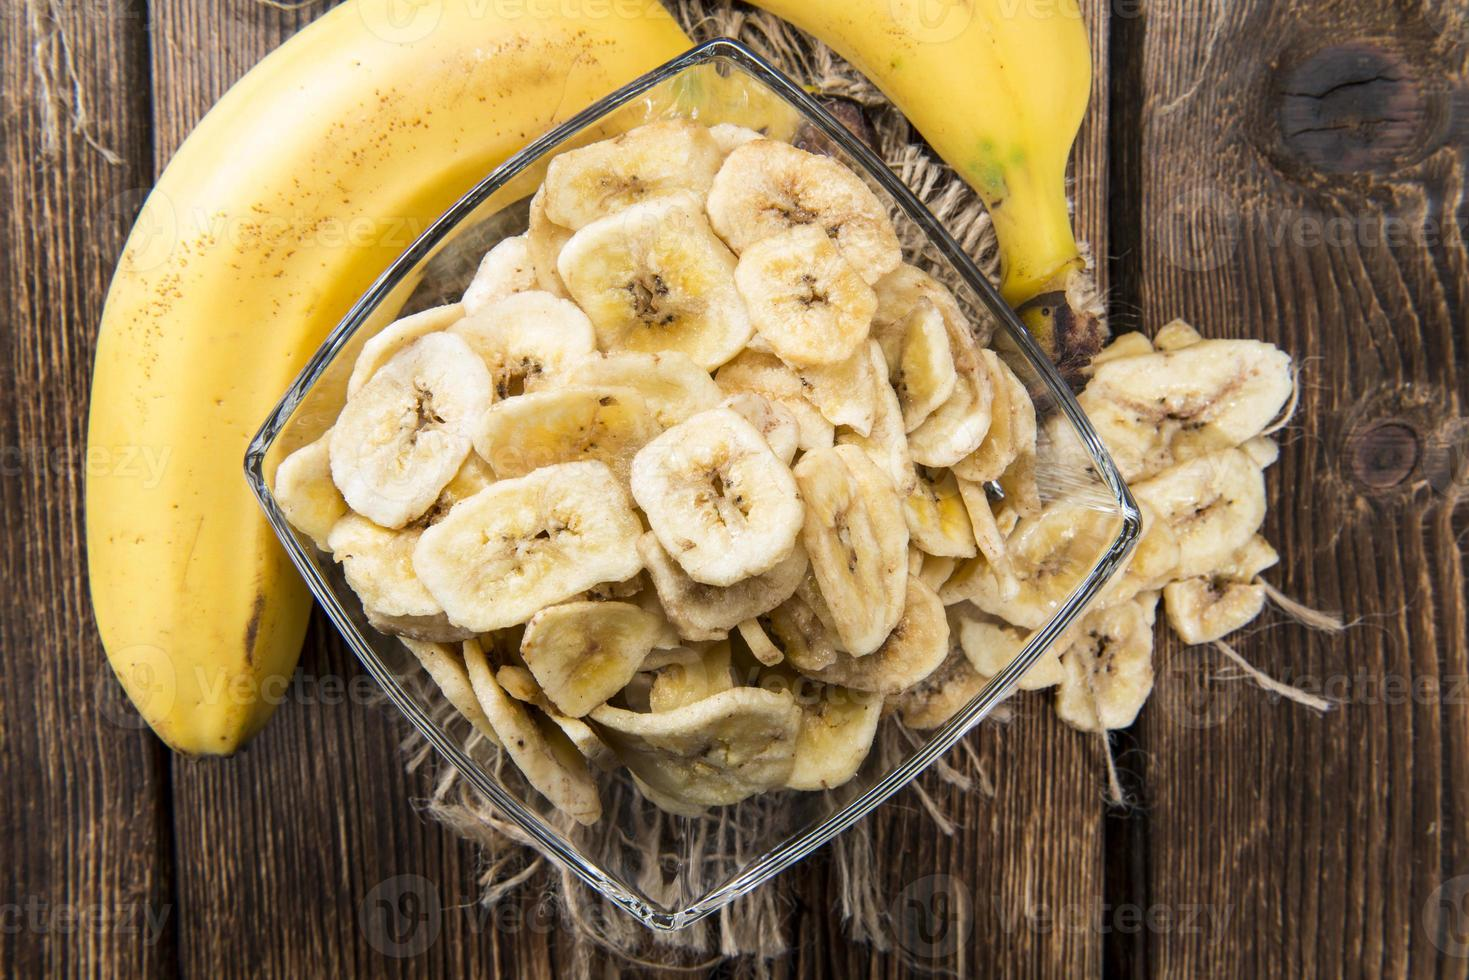 bananchips (närbild) foto